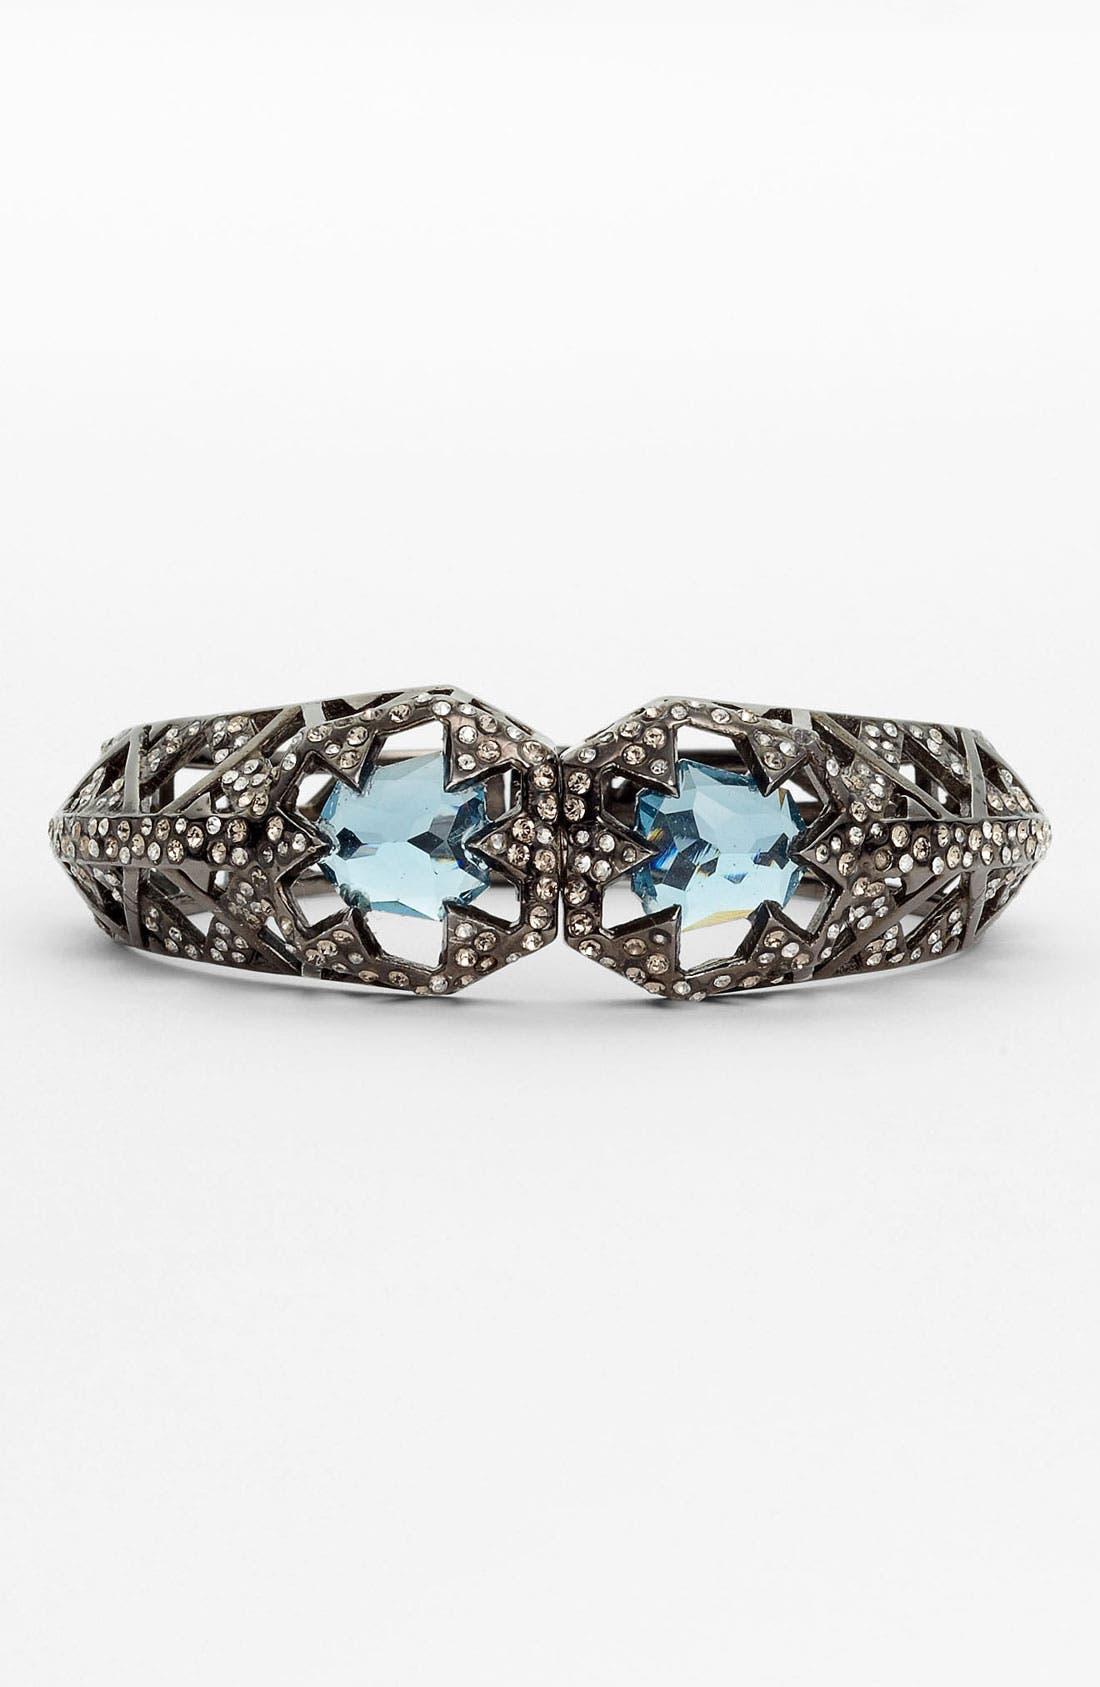 Alternate Image 1 Selected - Alexis Bittar 'Miss Havisham - Deco' Hinged Bracelet (Nordstrom Exclusive)